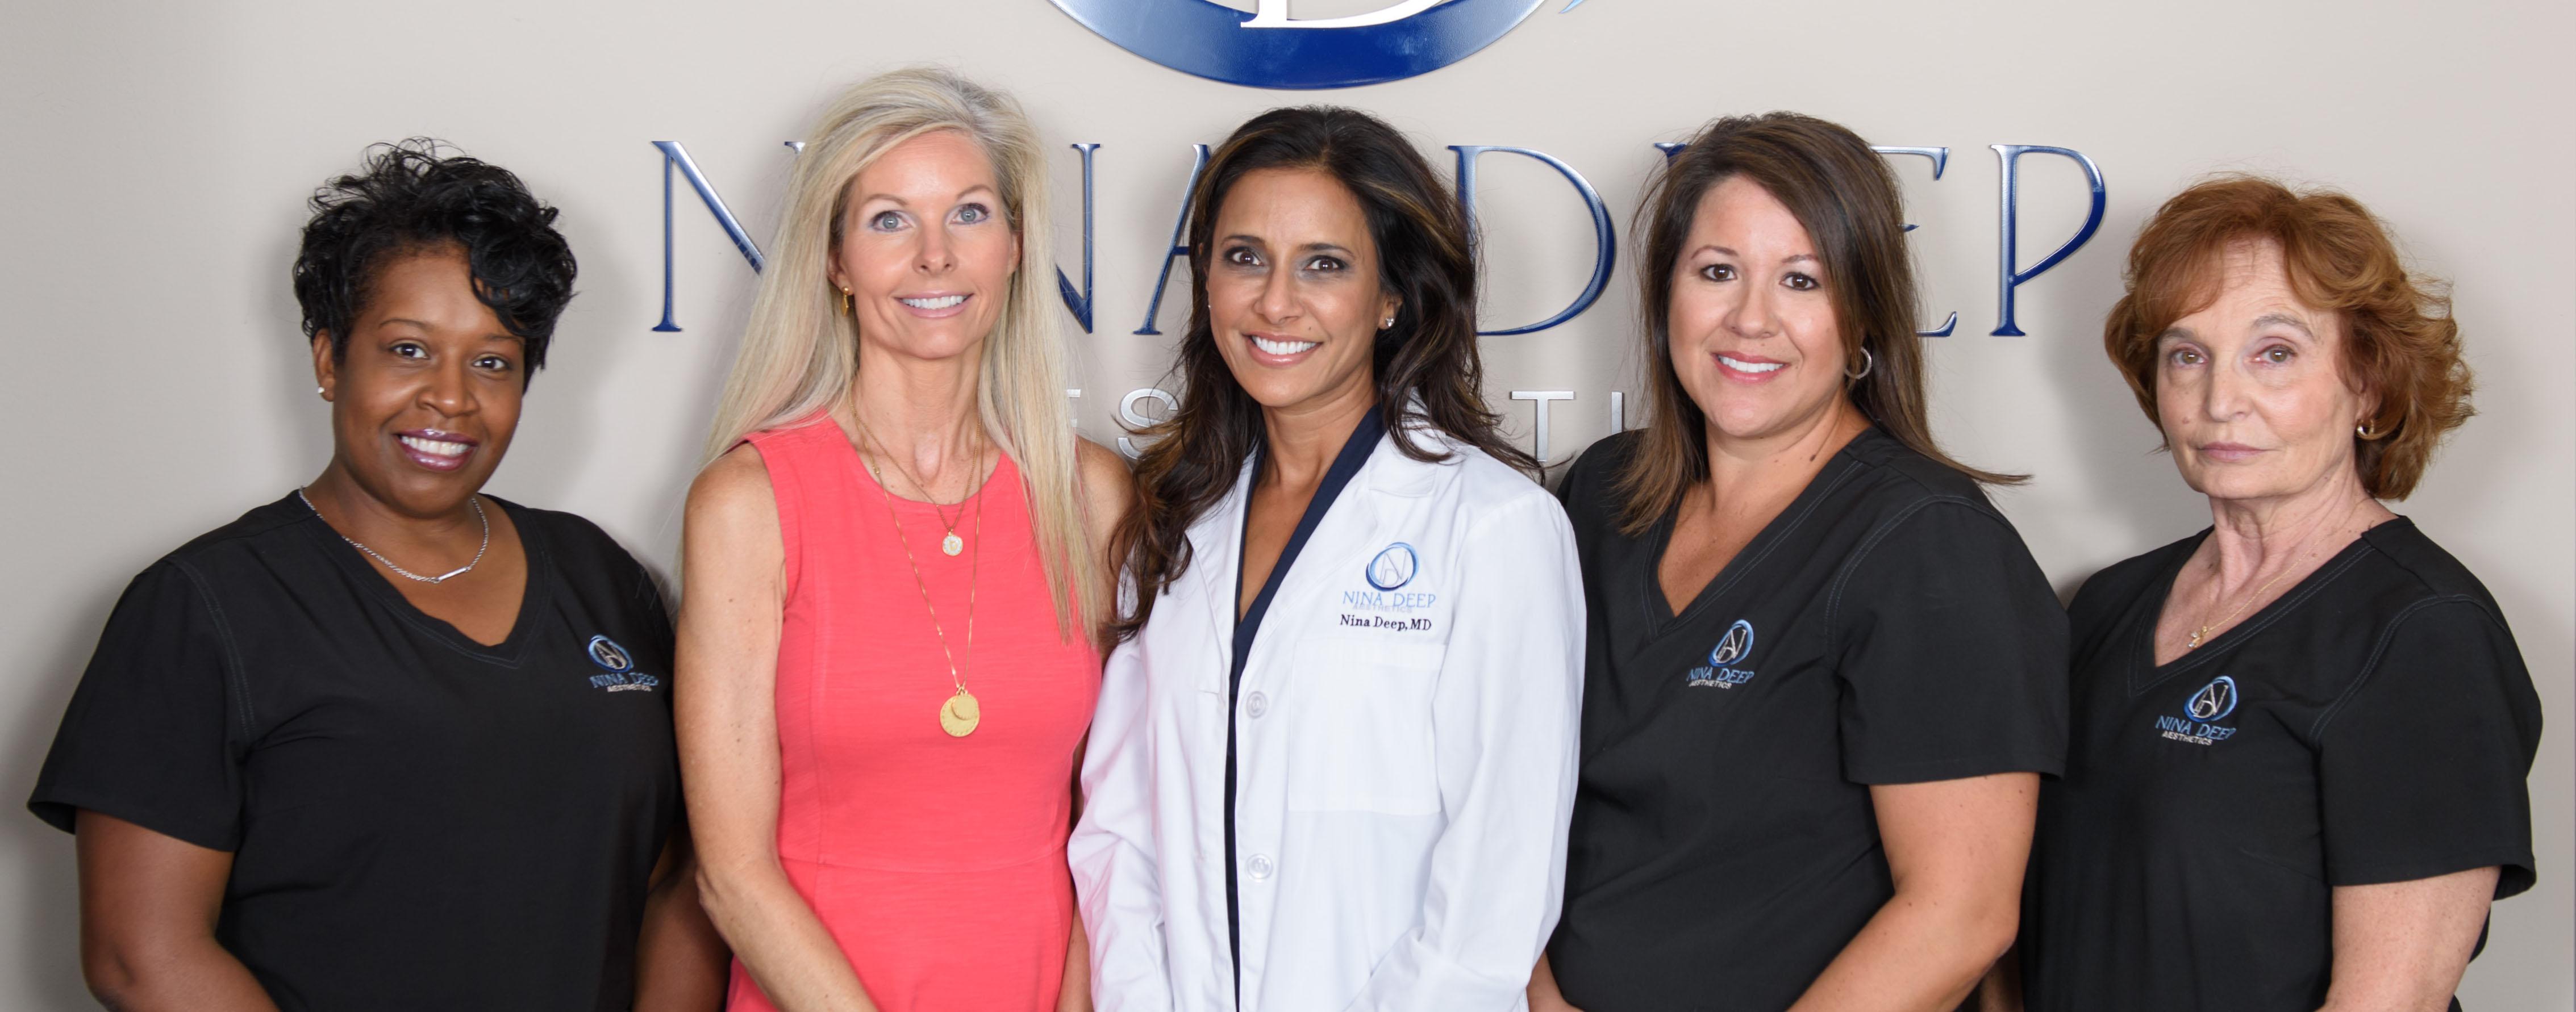 Dr. Nina Deep and her staff